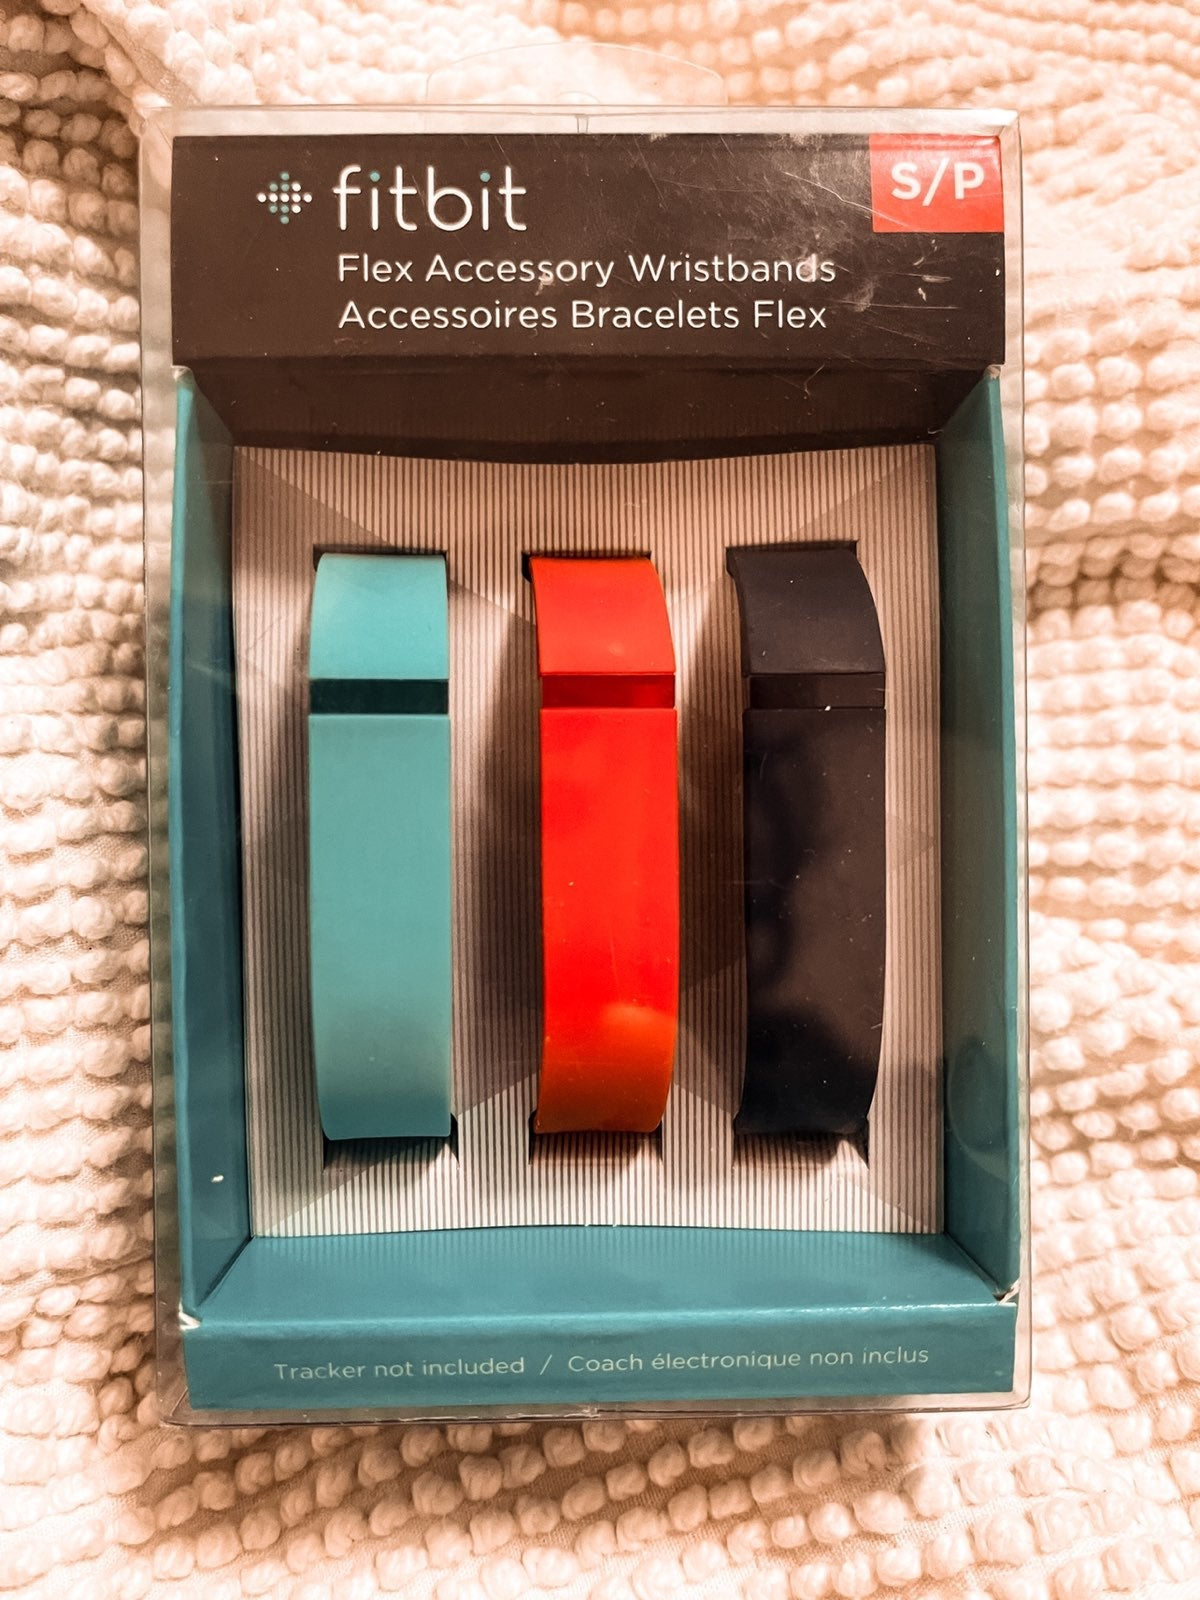 Fitbit Flex Accessory Wristbands